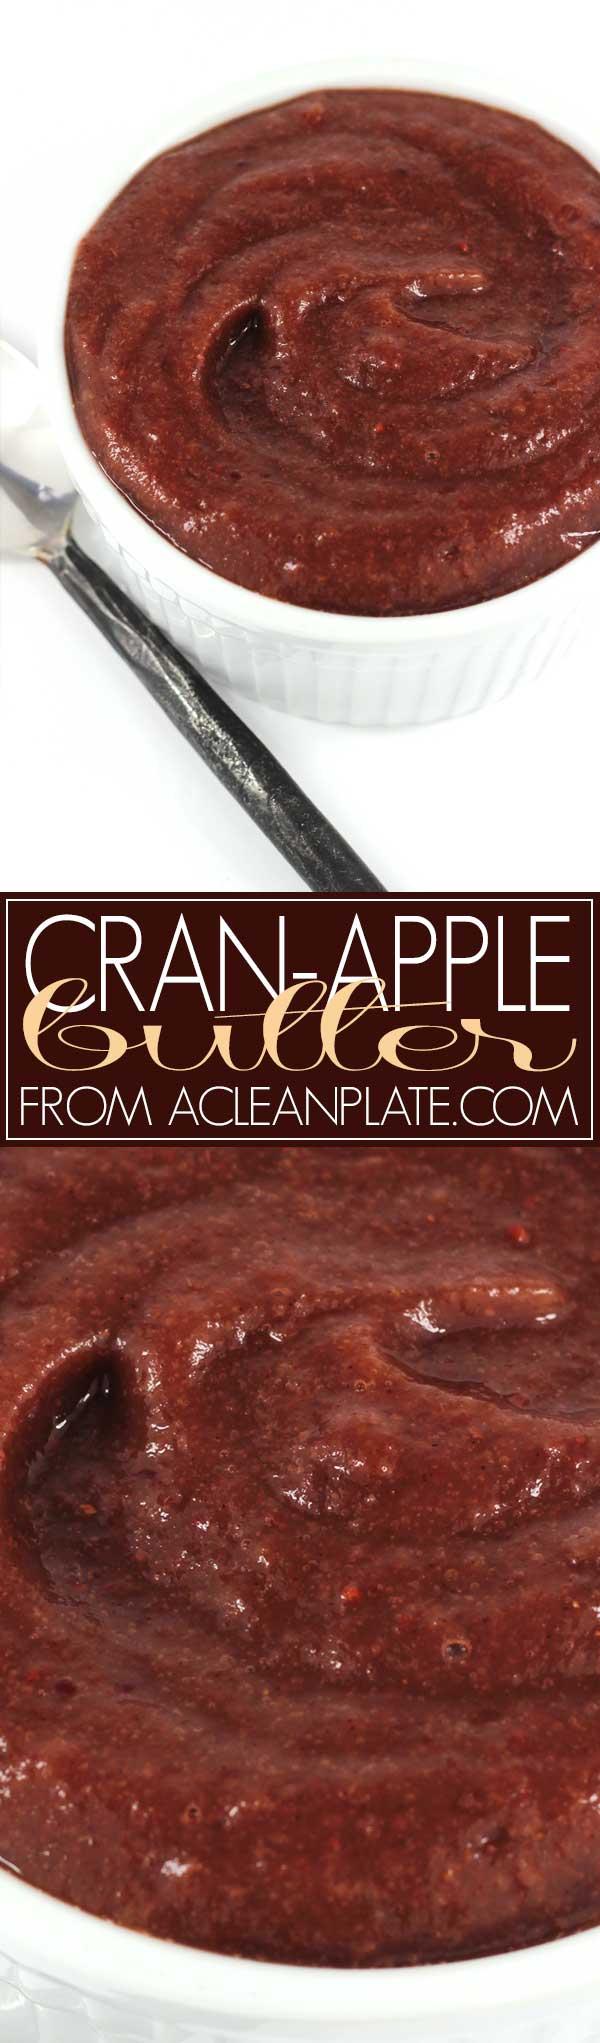 Cran-Apple Butter recipe from acleanplate.com